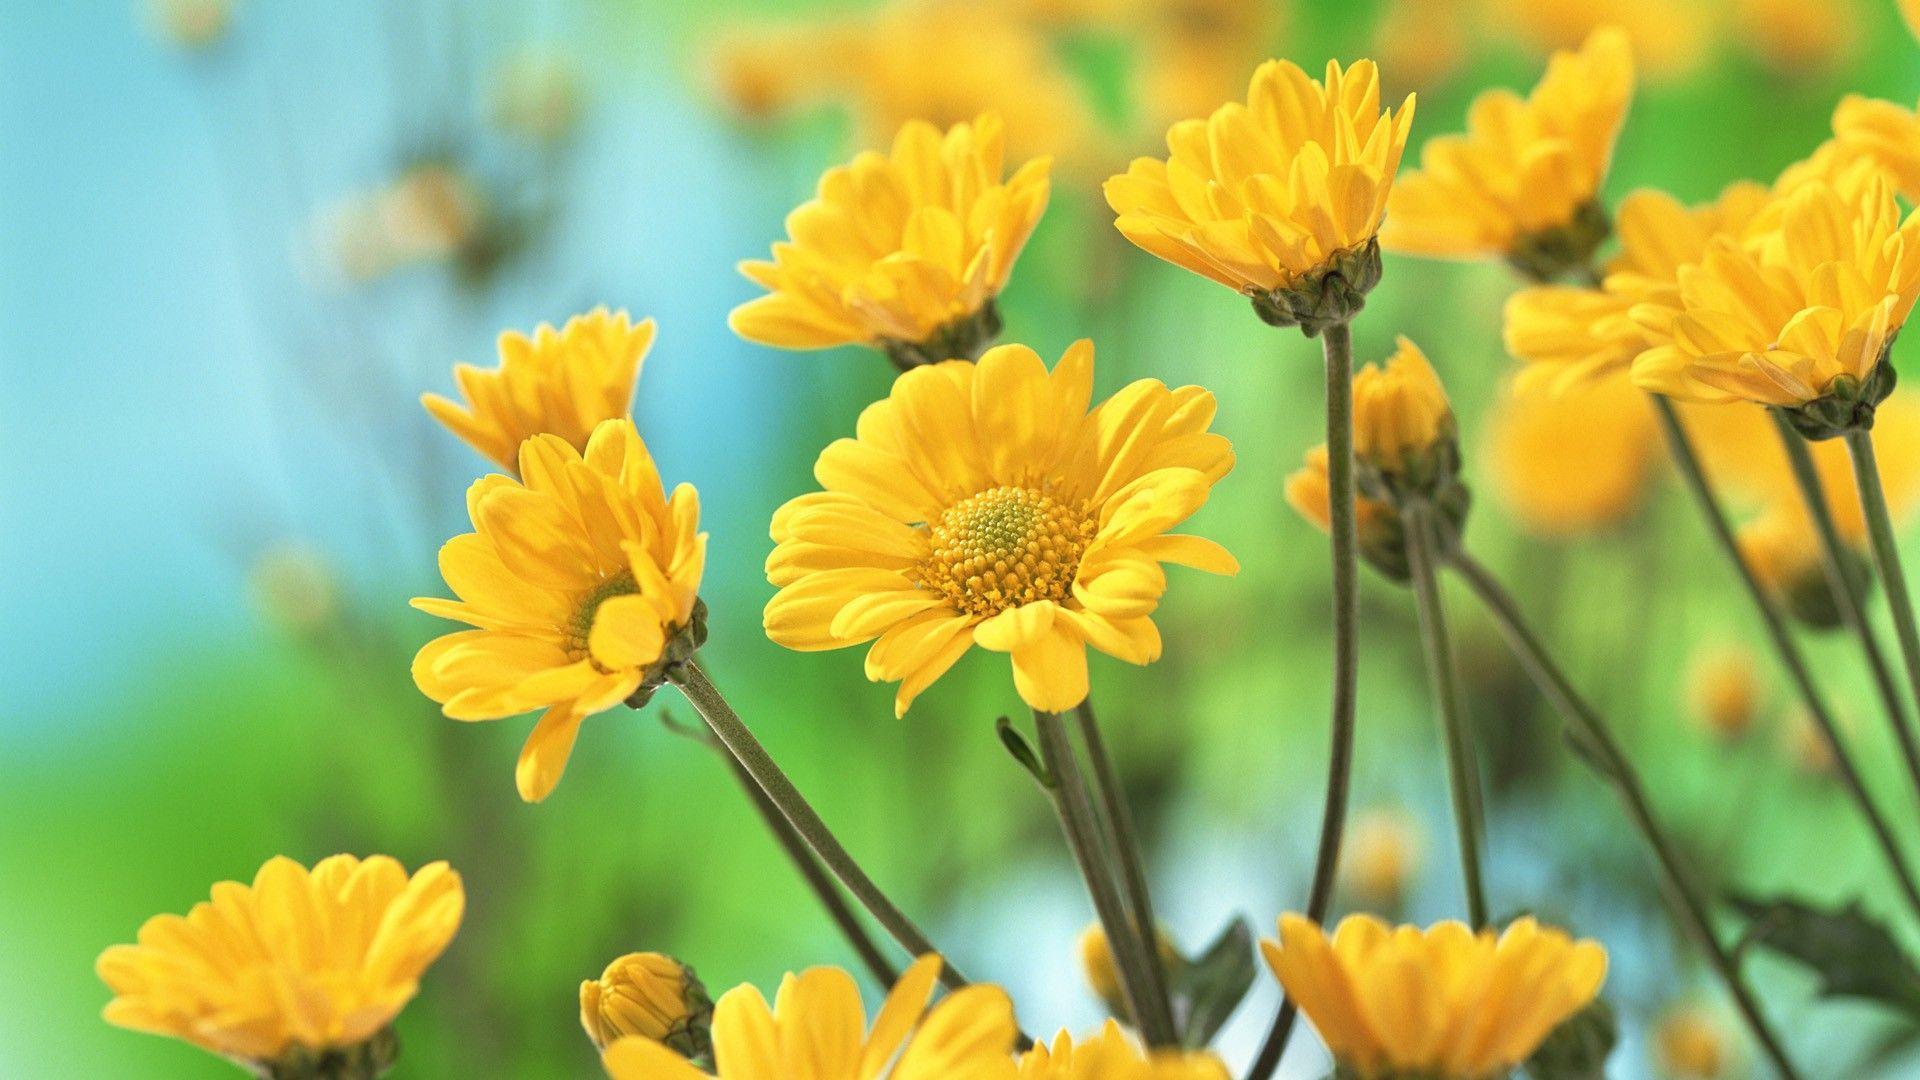 Yellow Flower Desktop Wallpapers Top Free Yellow Flower Desktop